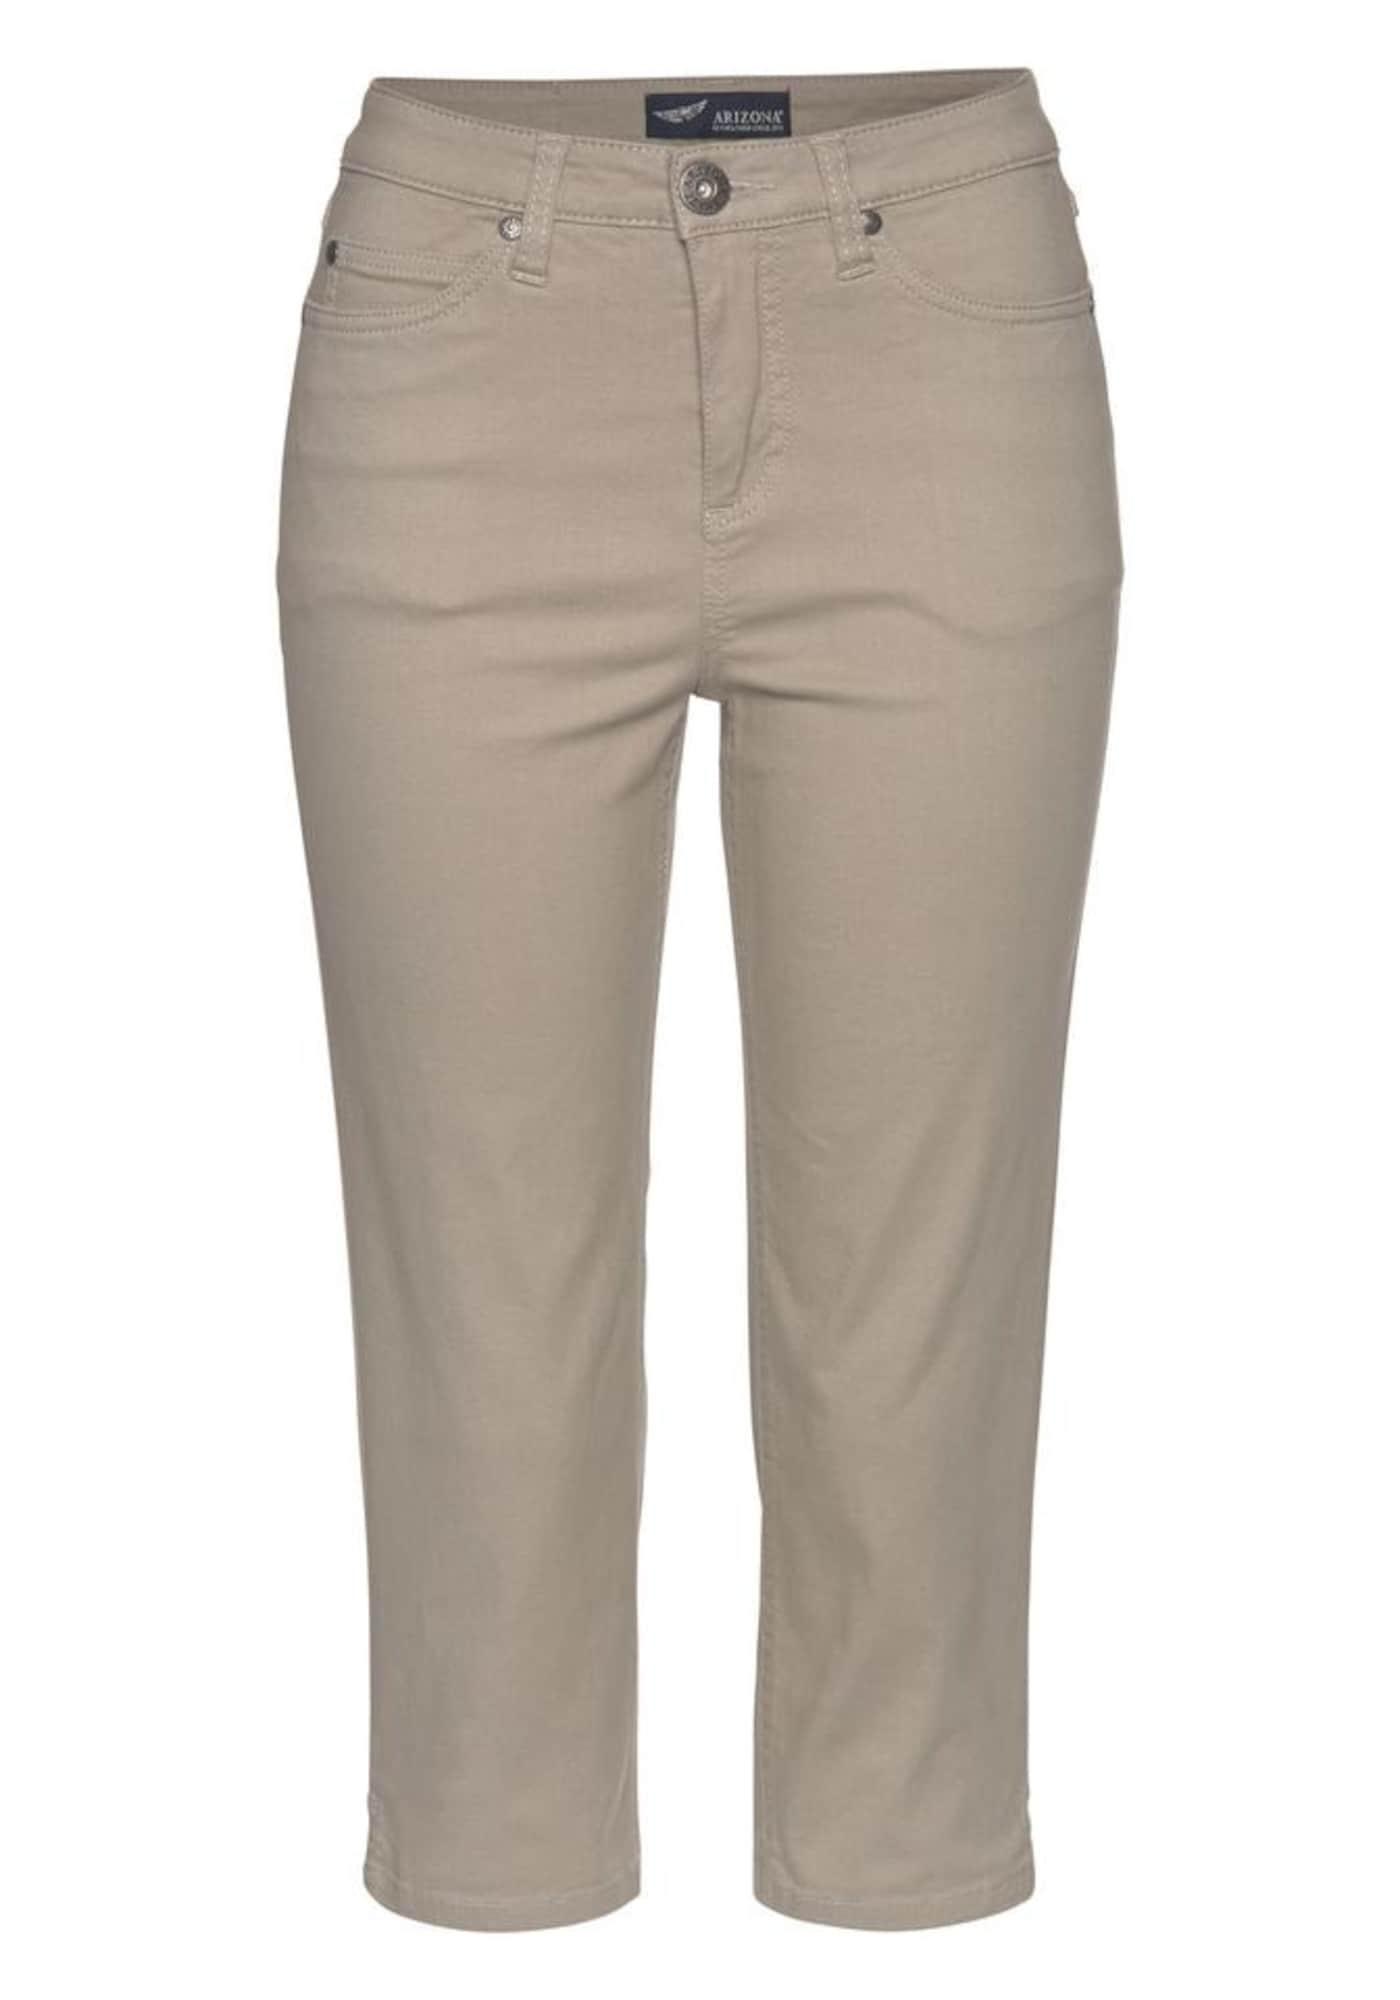 Caprijeans 'Comfort-Fit' | Bekleidung > Jeans > Caprijeans | ARIZONA